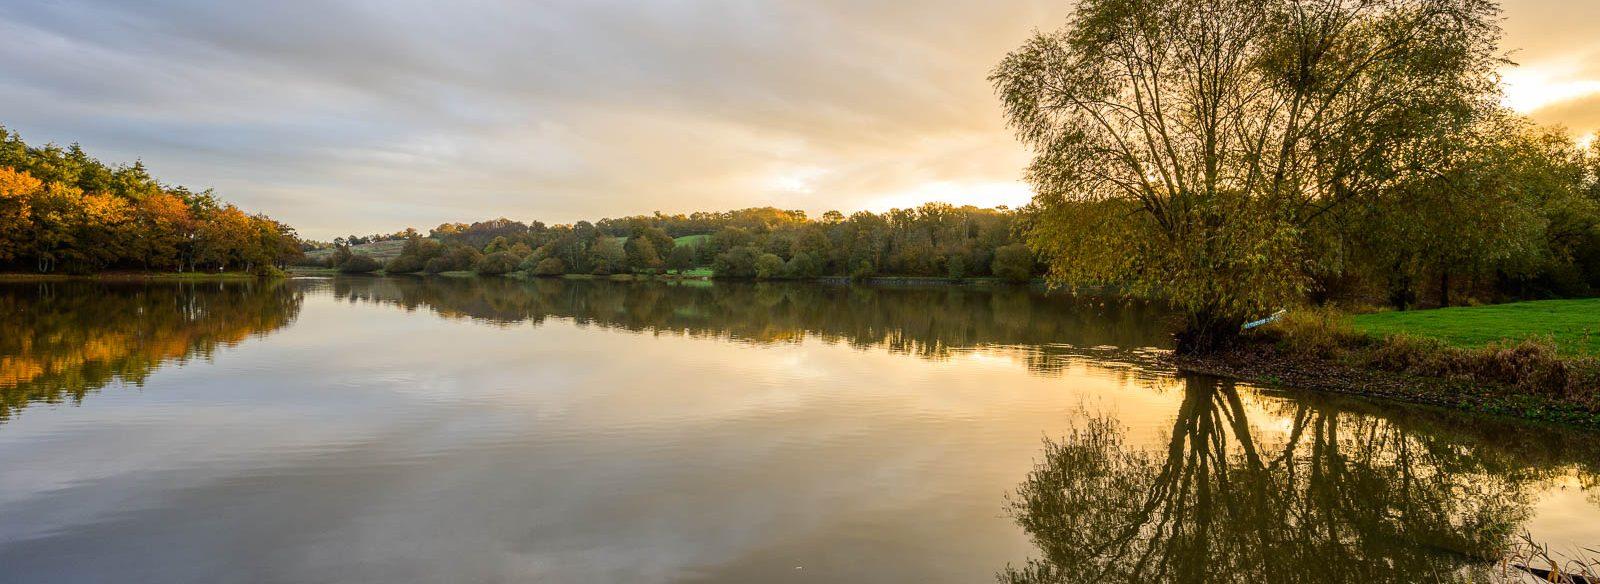 Lac du jaunay 3